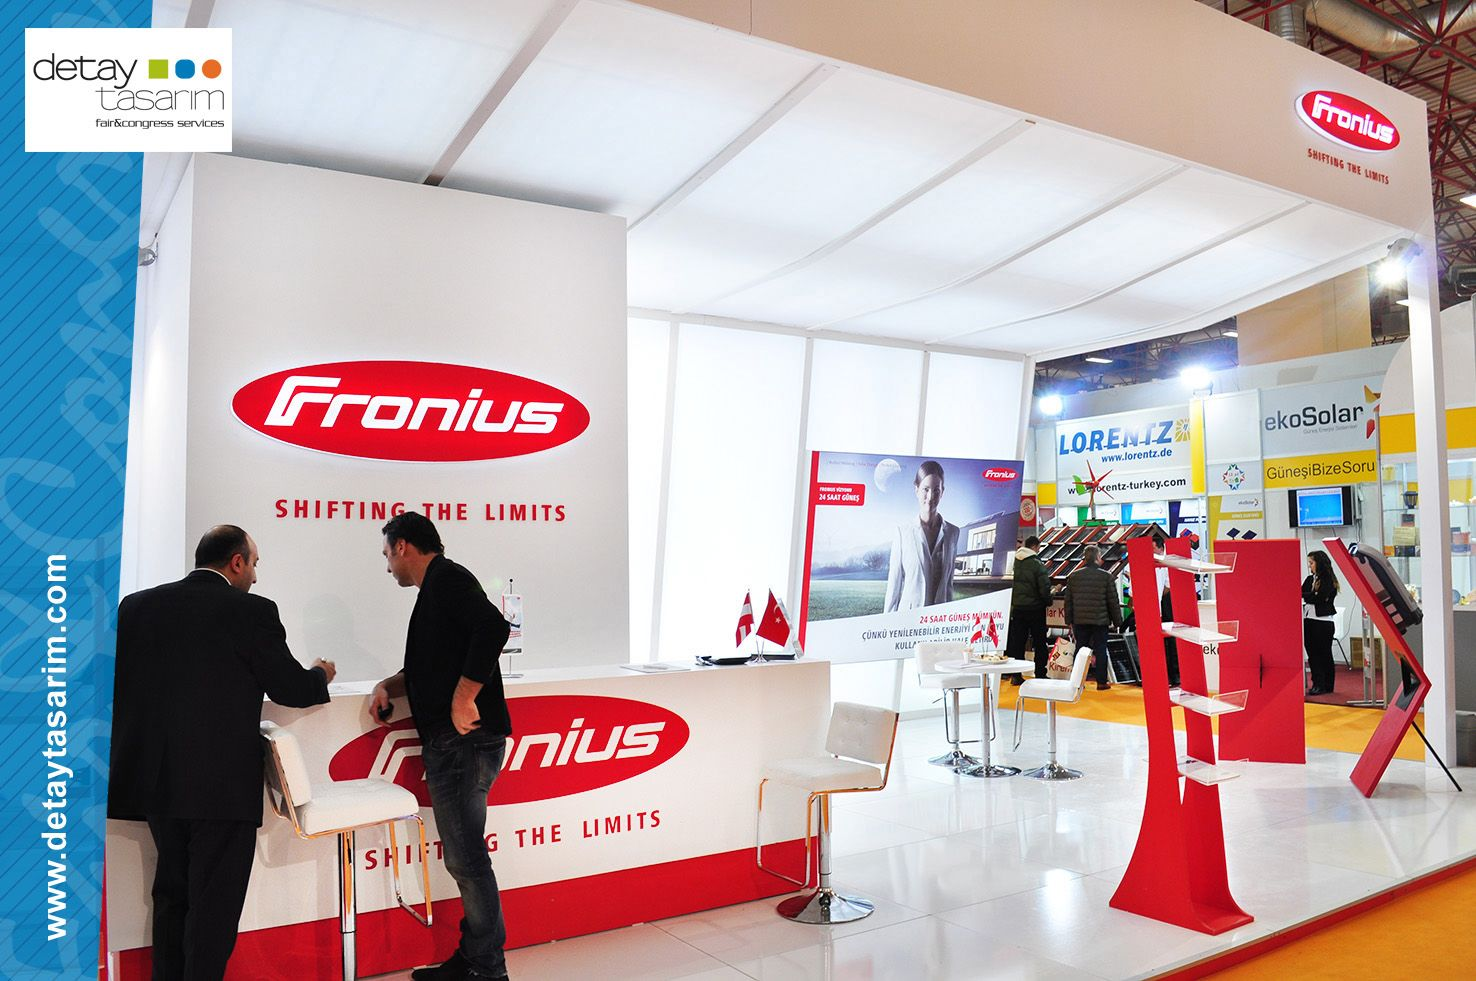 Fronius Stand by Detay Tasarım 3